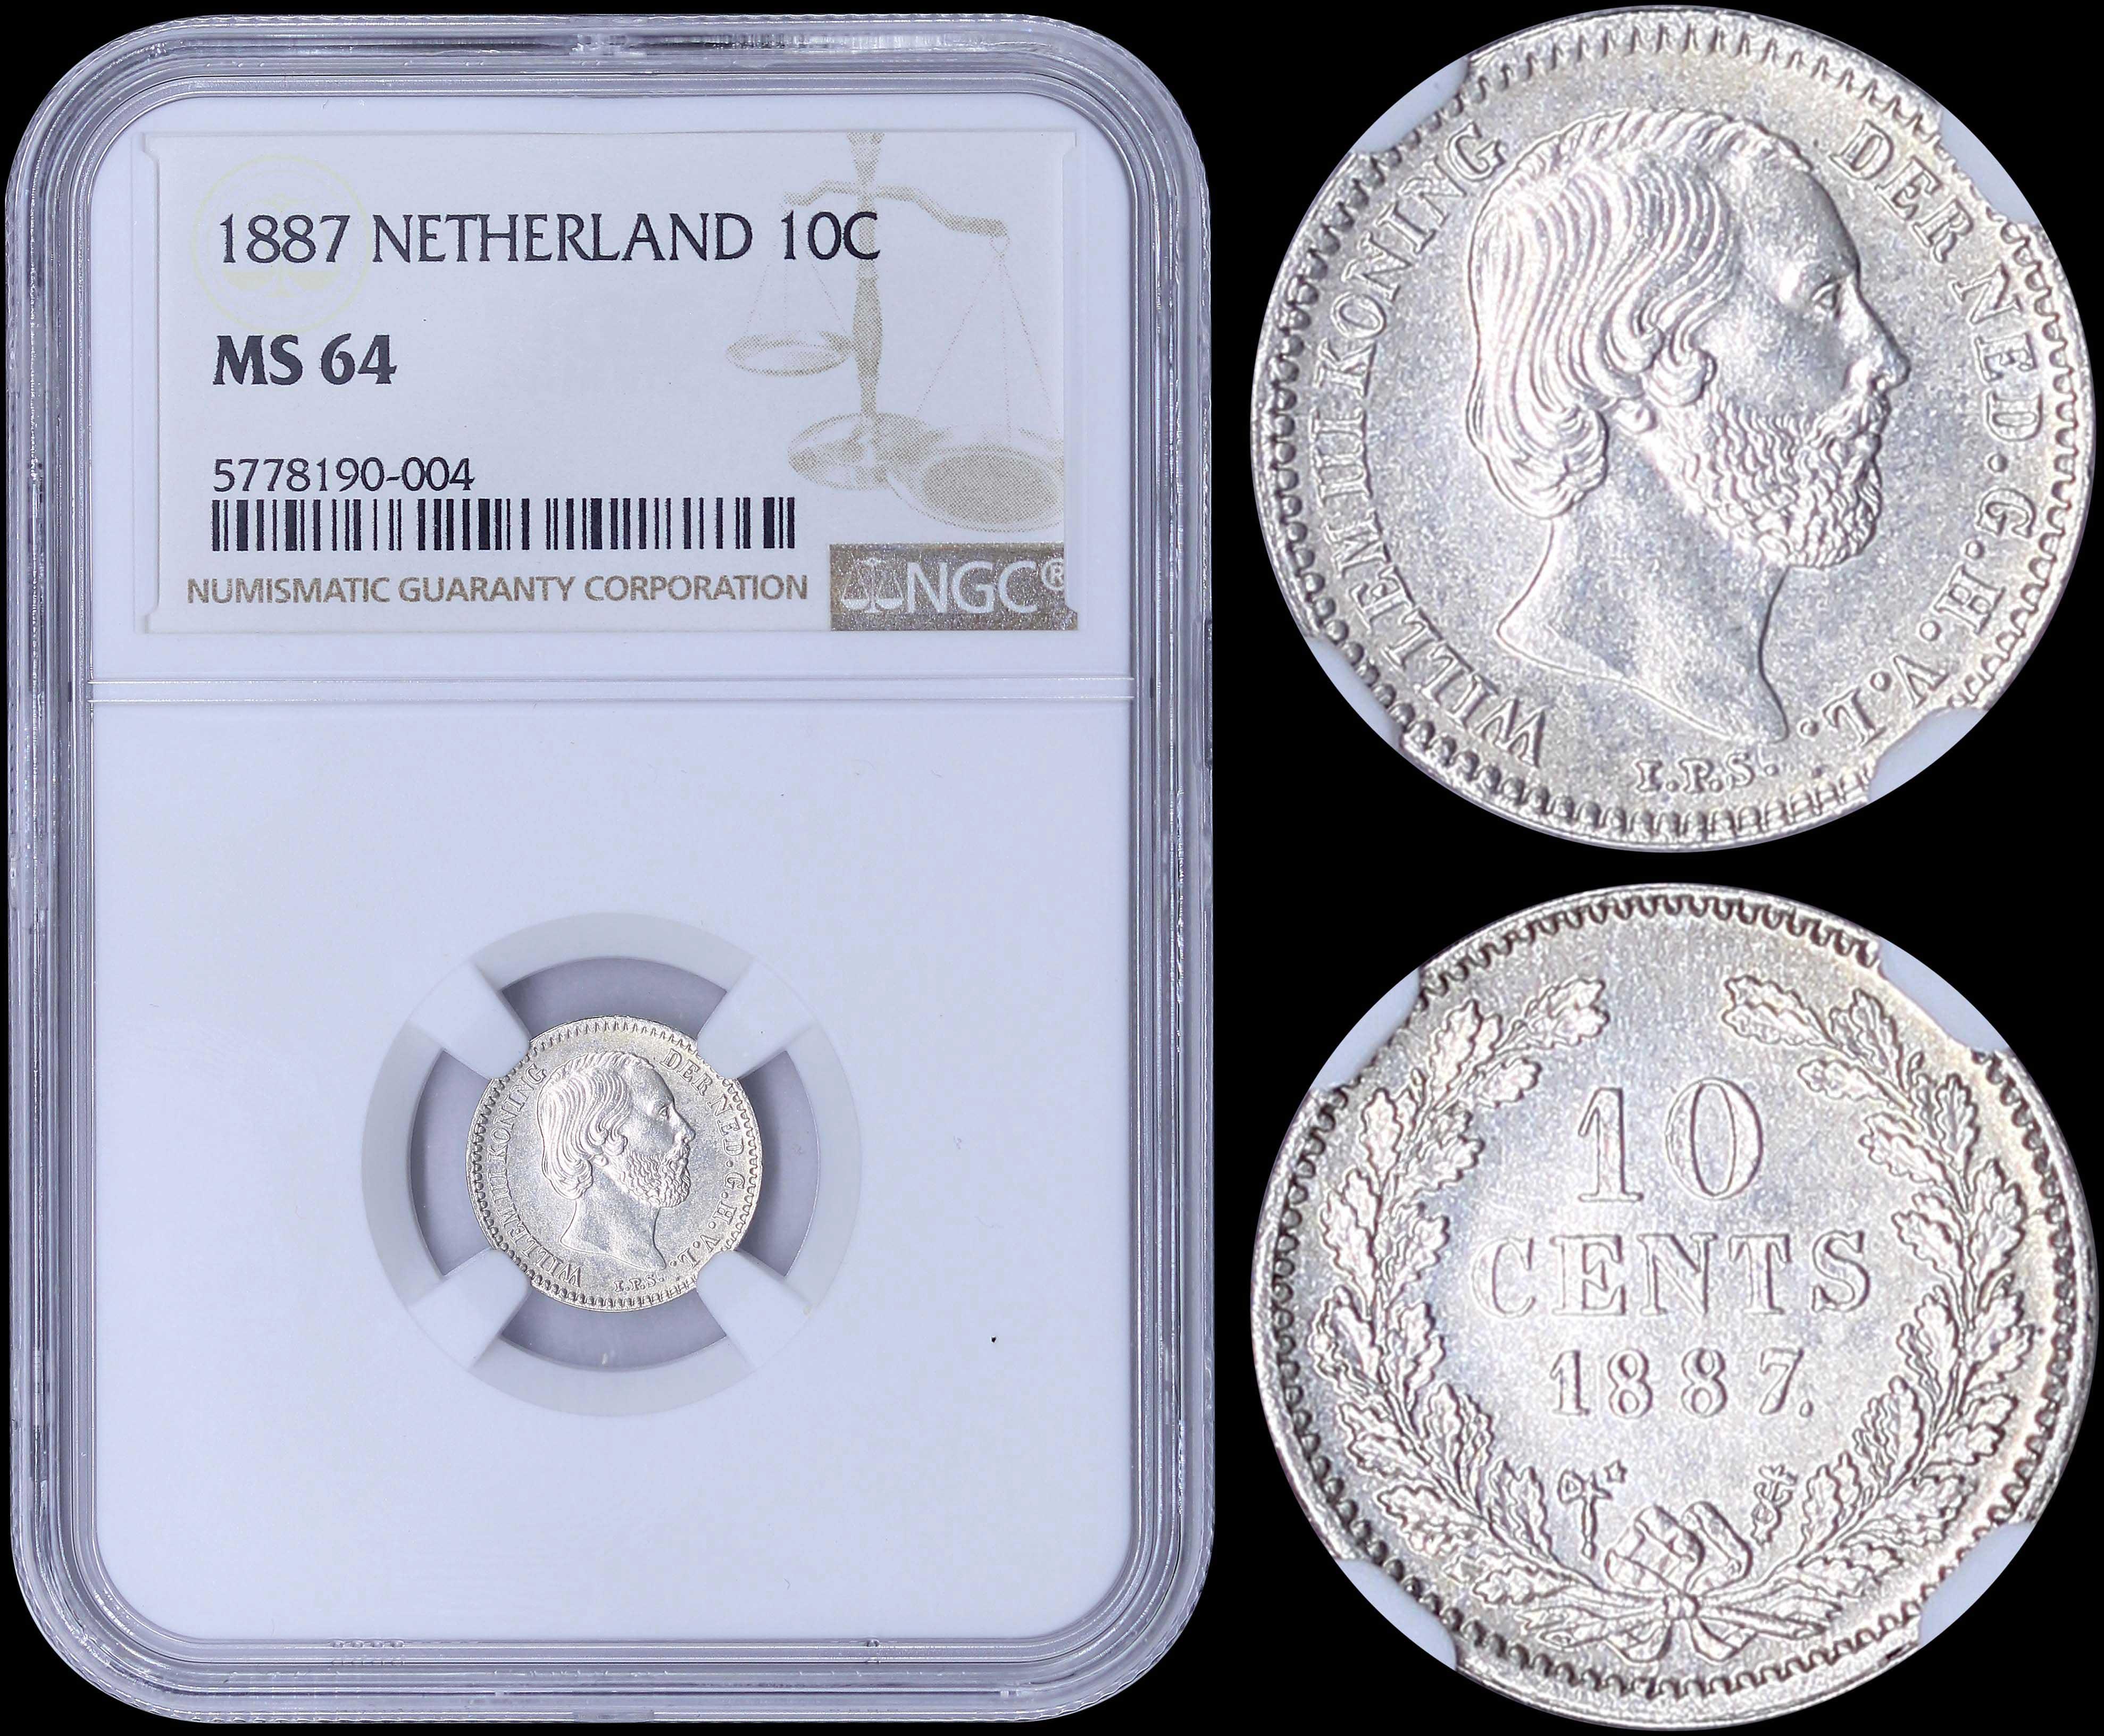 Lot 6992 - -  COINS & TOKENS COINS & TOKENS OF EUROPEAN COUNTRIES -  A. Karamitsos Postal & Live Internet Auction 984 (Part B)